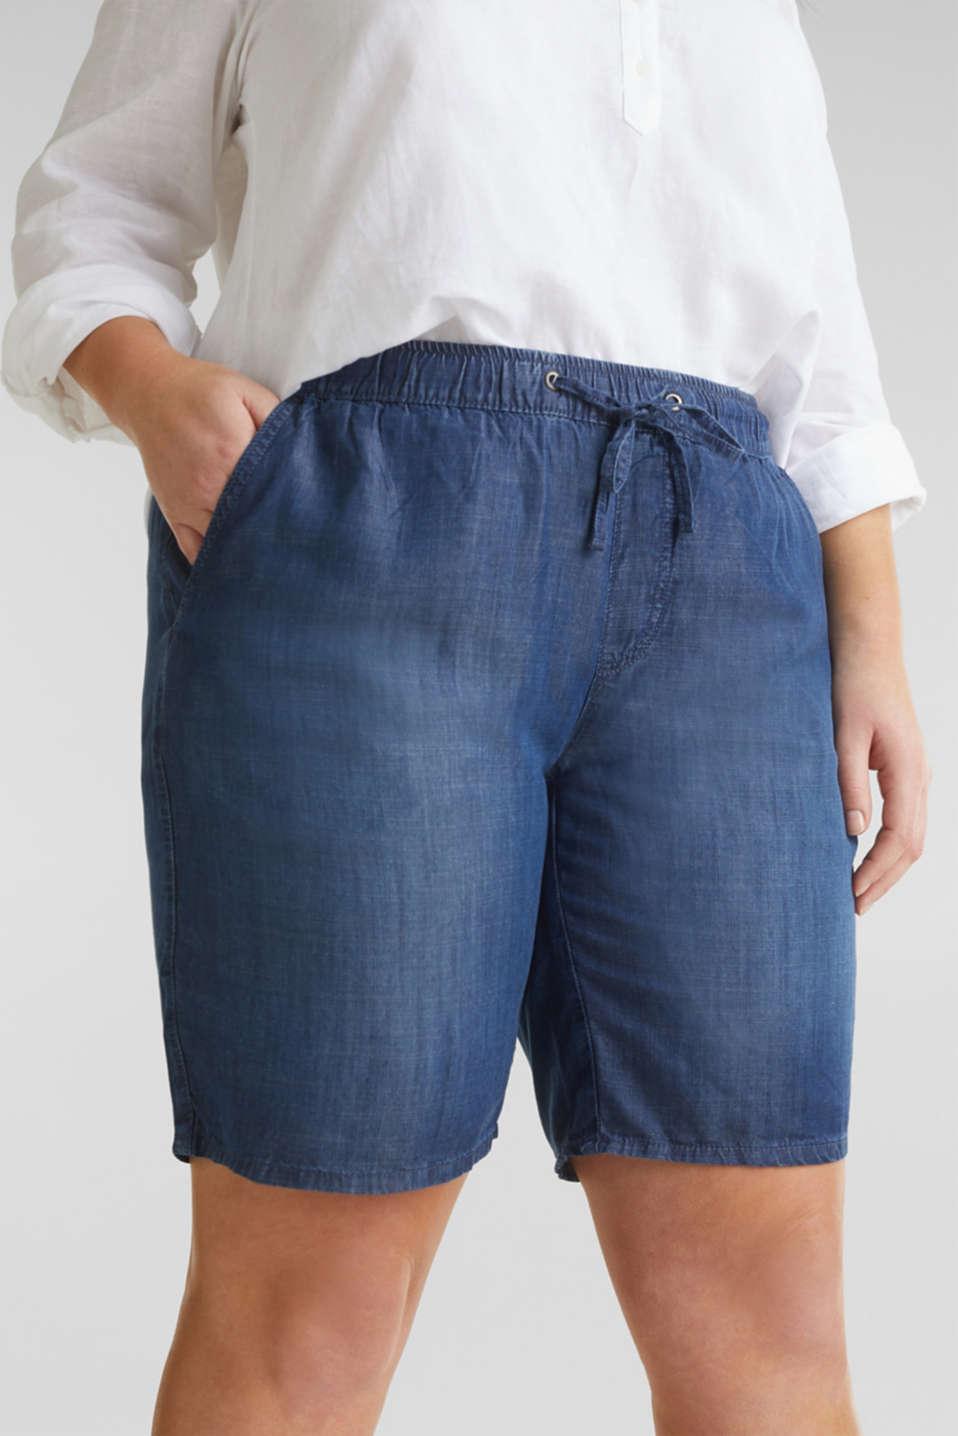 CURVY lyocell denim shorts, BLUE DARK WASH, detail image number 1